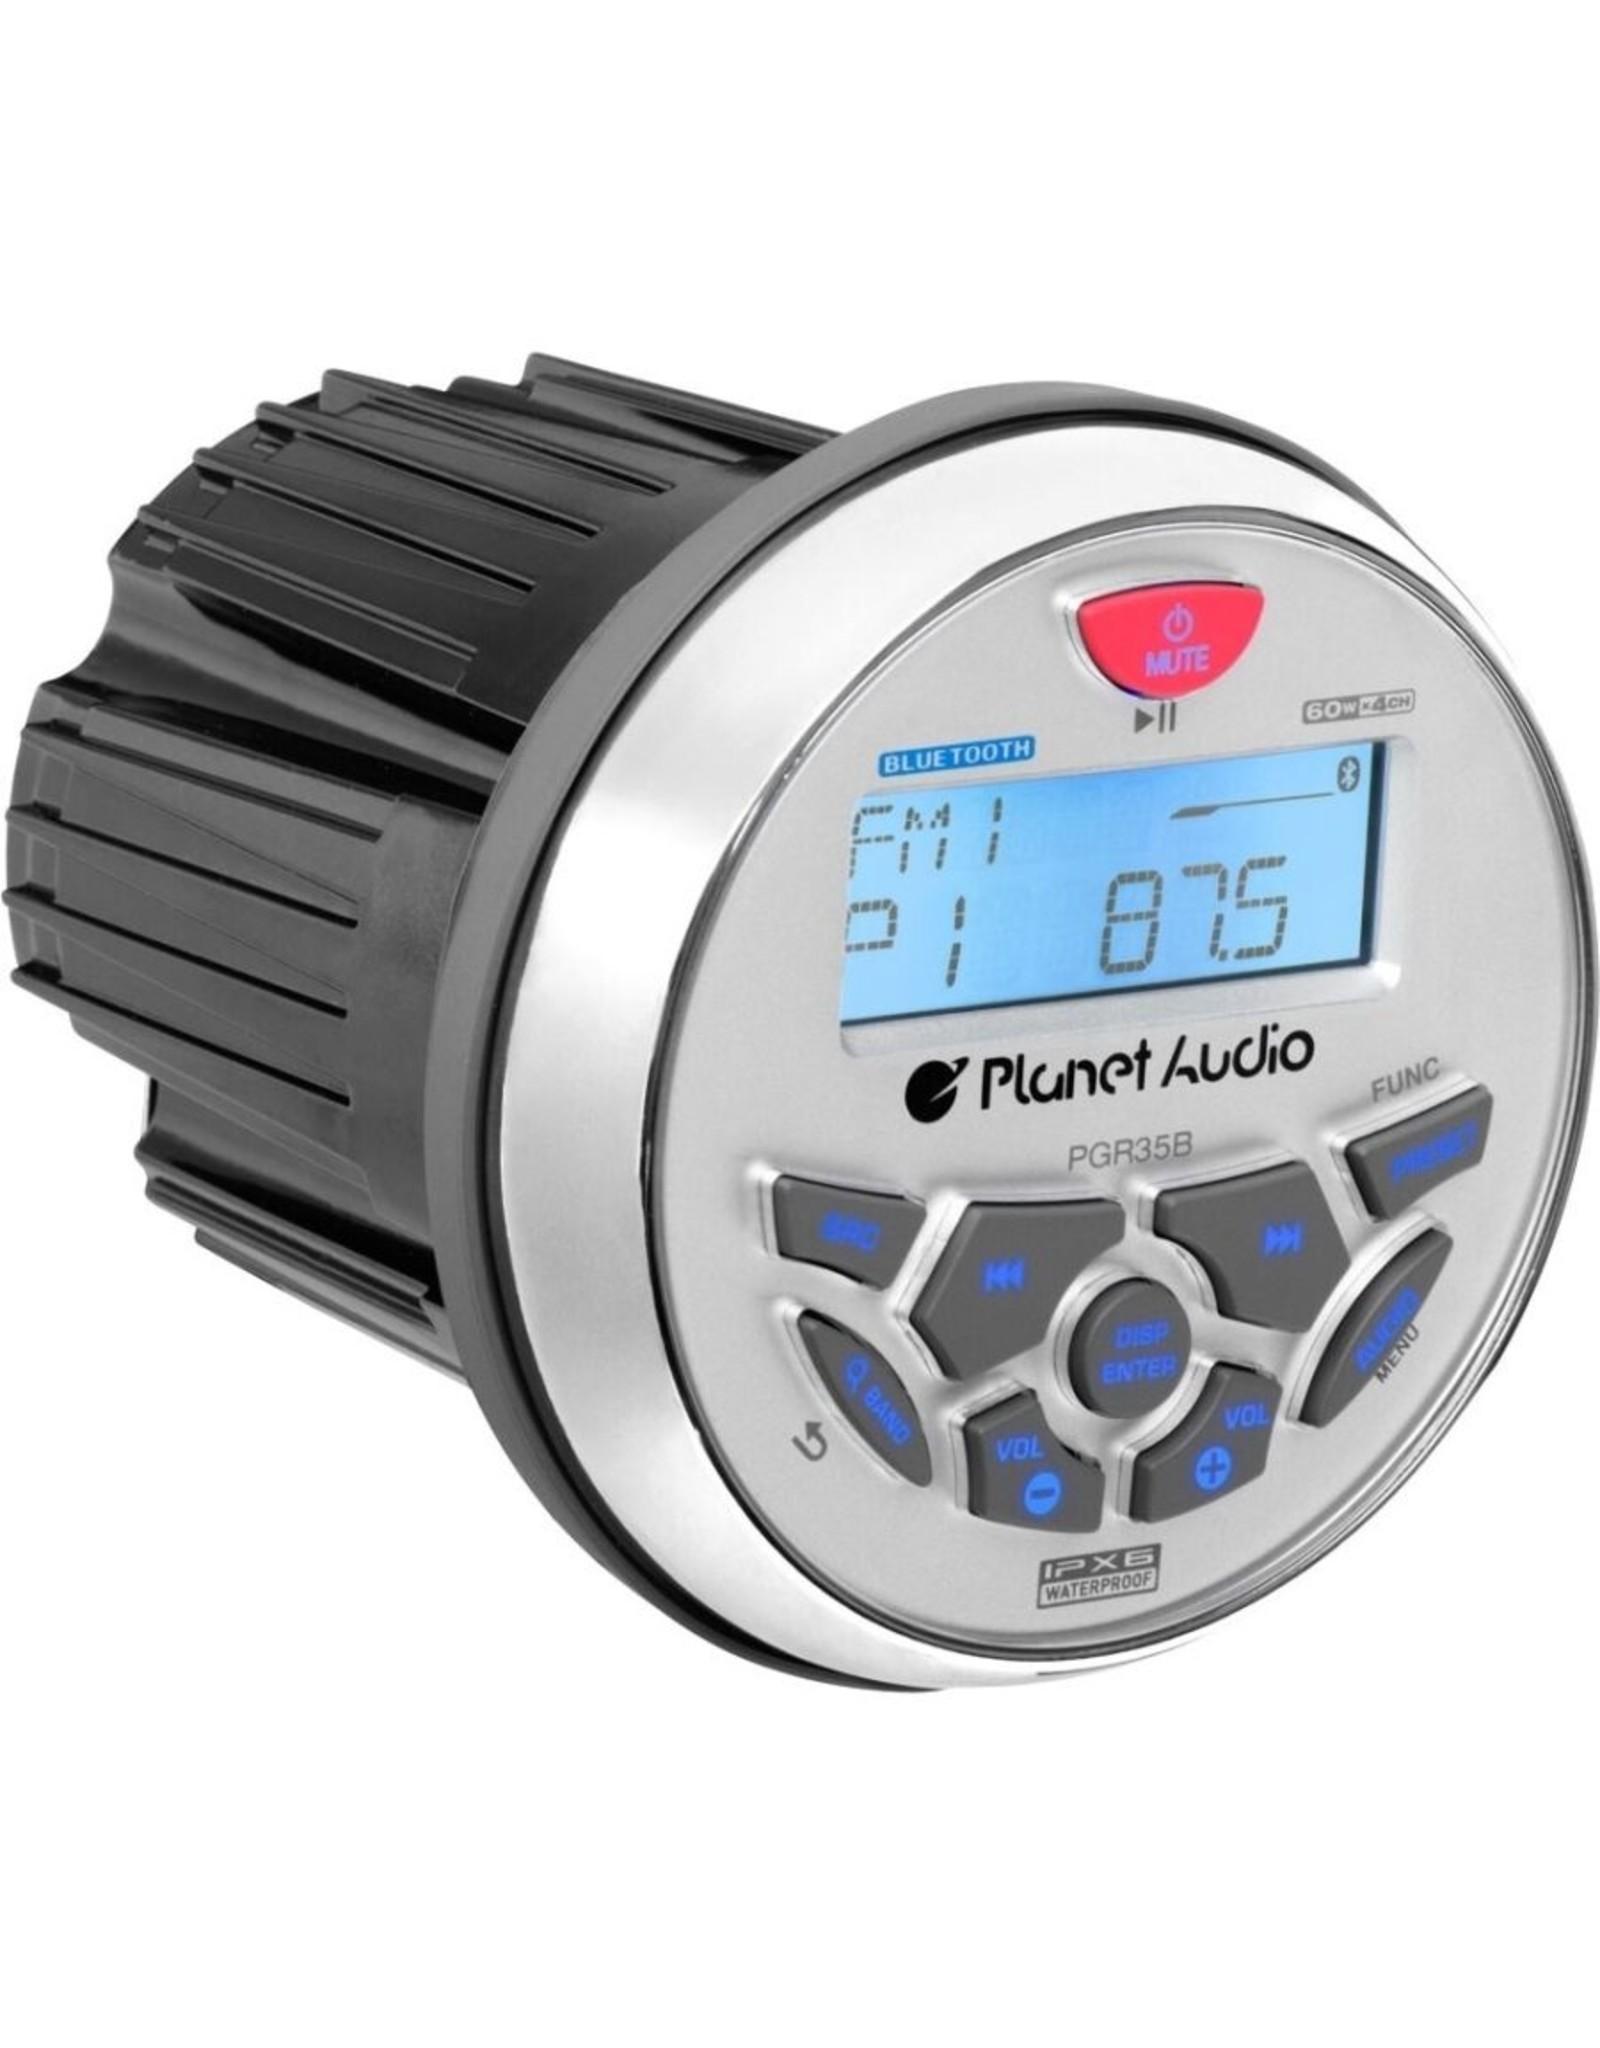 Planet Audio digitale media speler